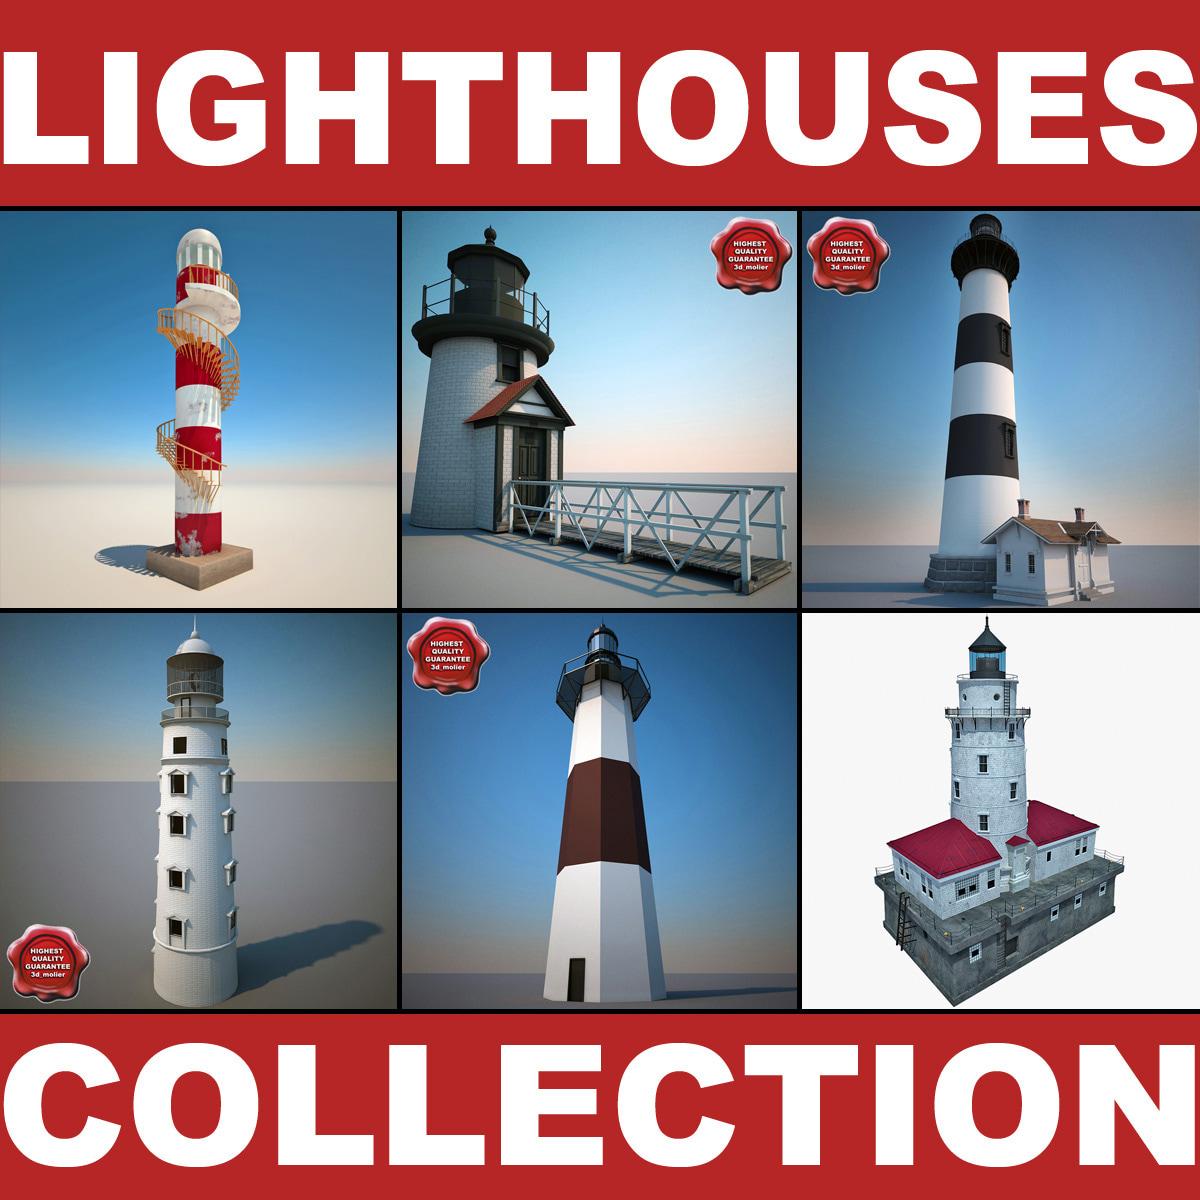 Lighthouses_Collection_v3_000.jpg